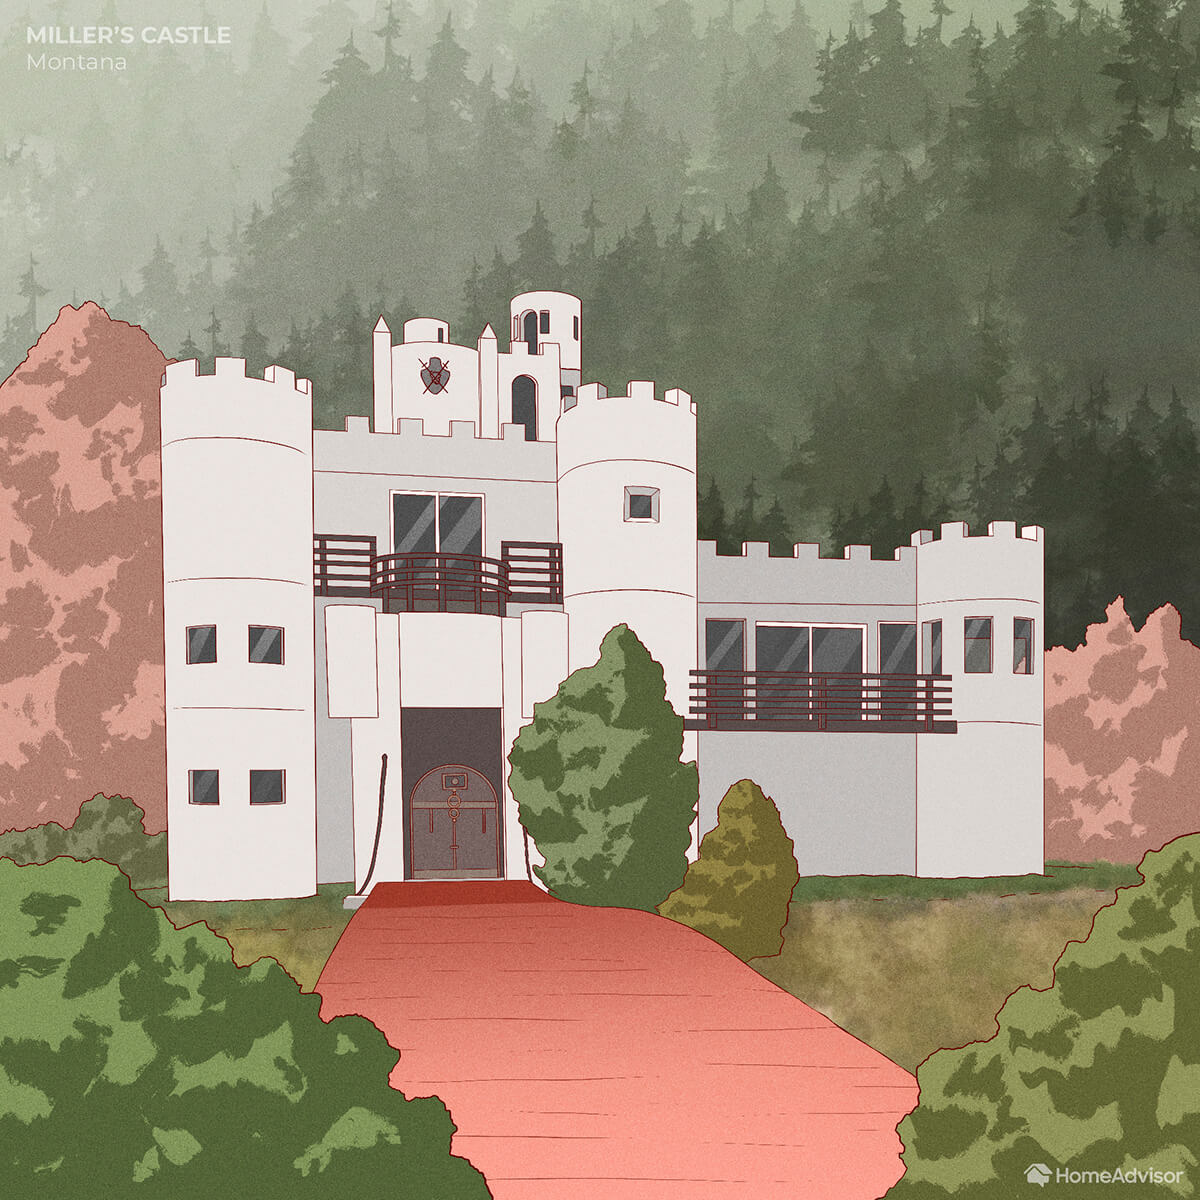 Millers Castle